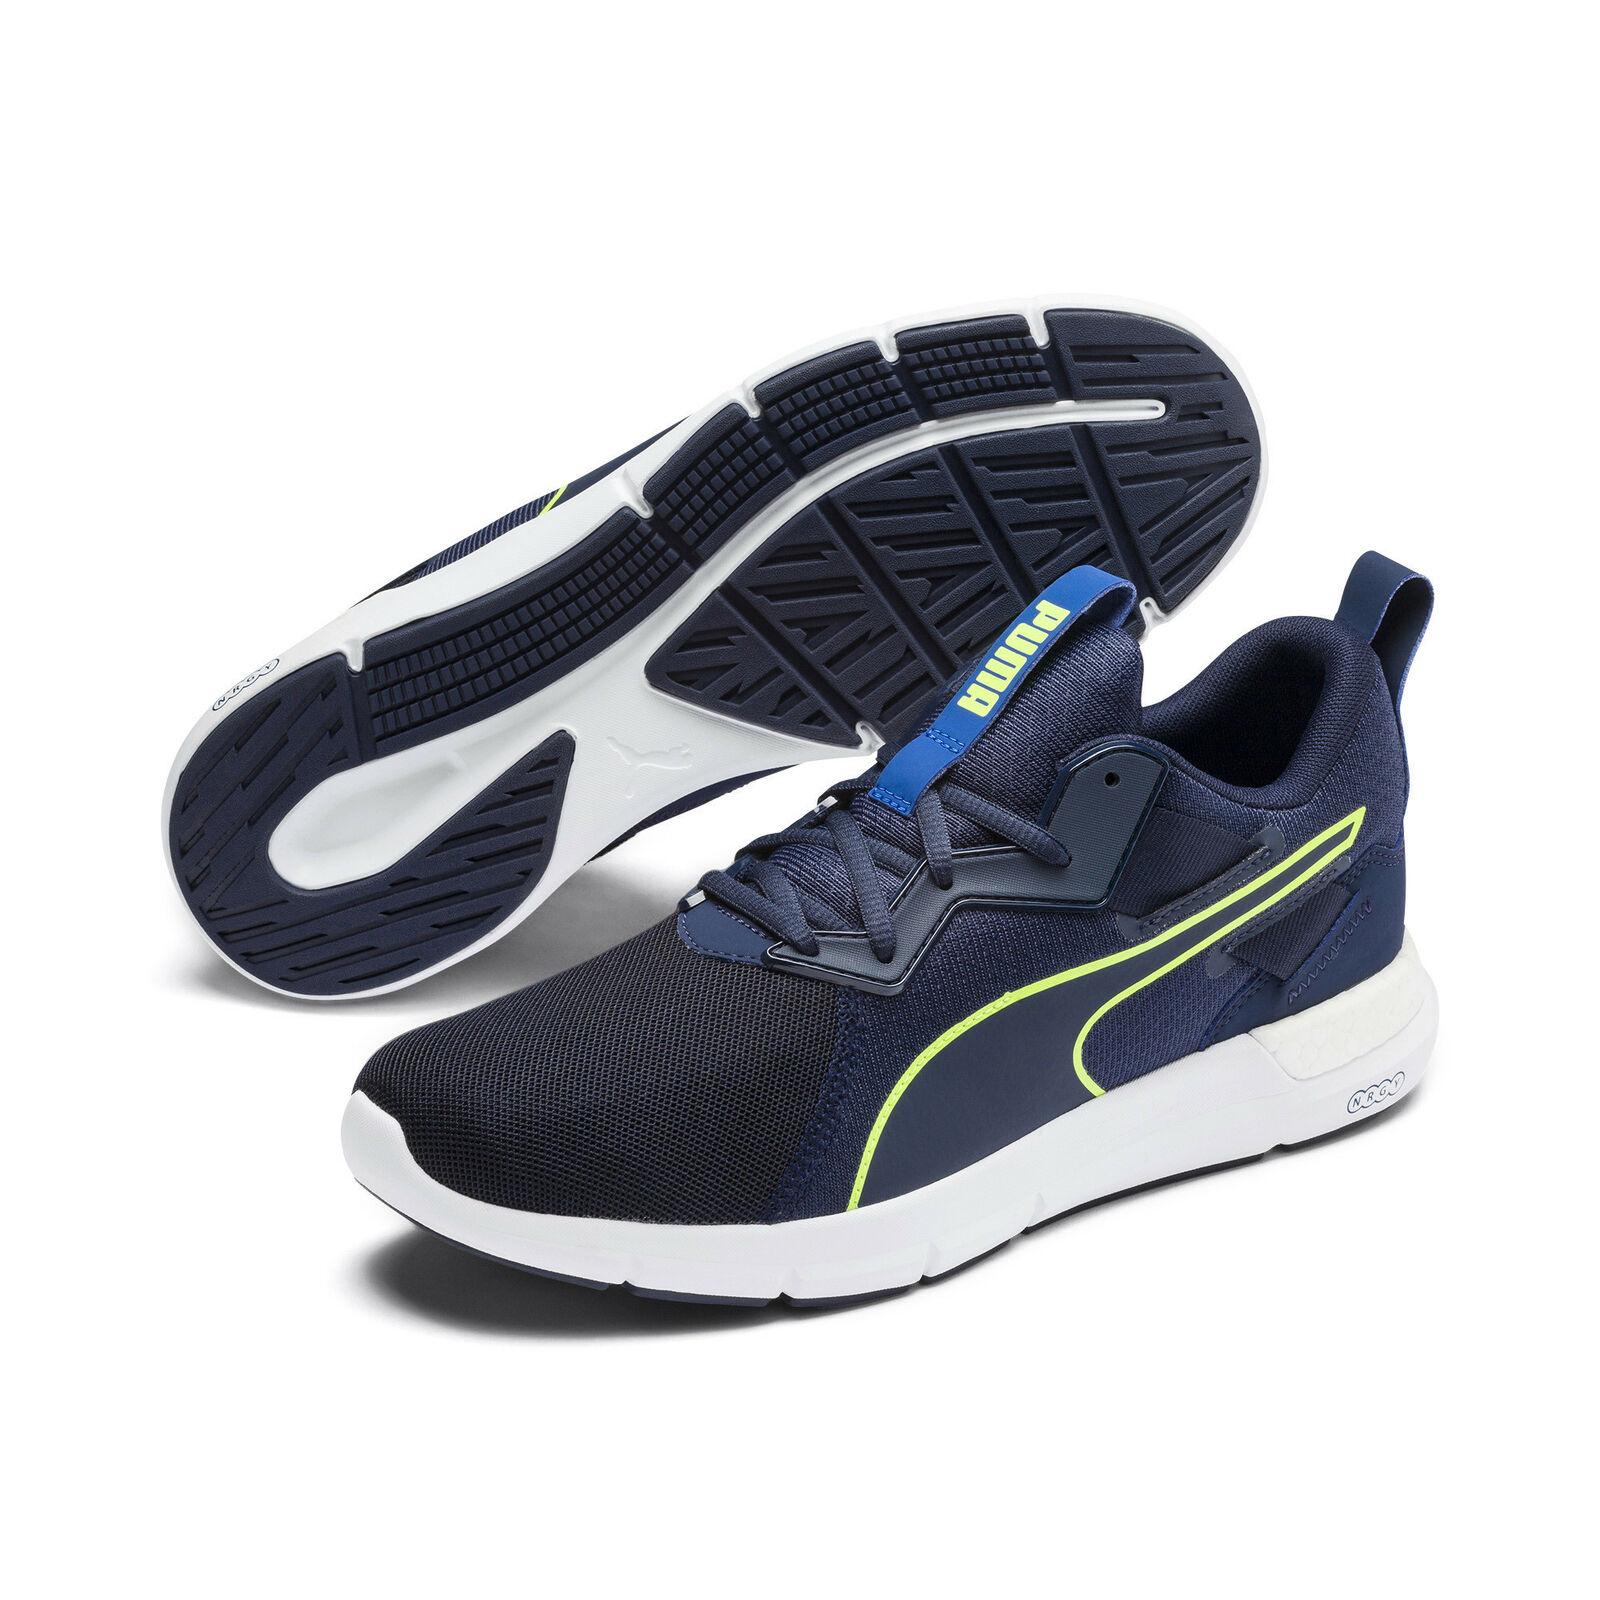 PUMA Ignite Netfit Men's Running Shoes